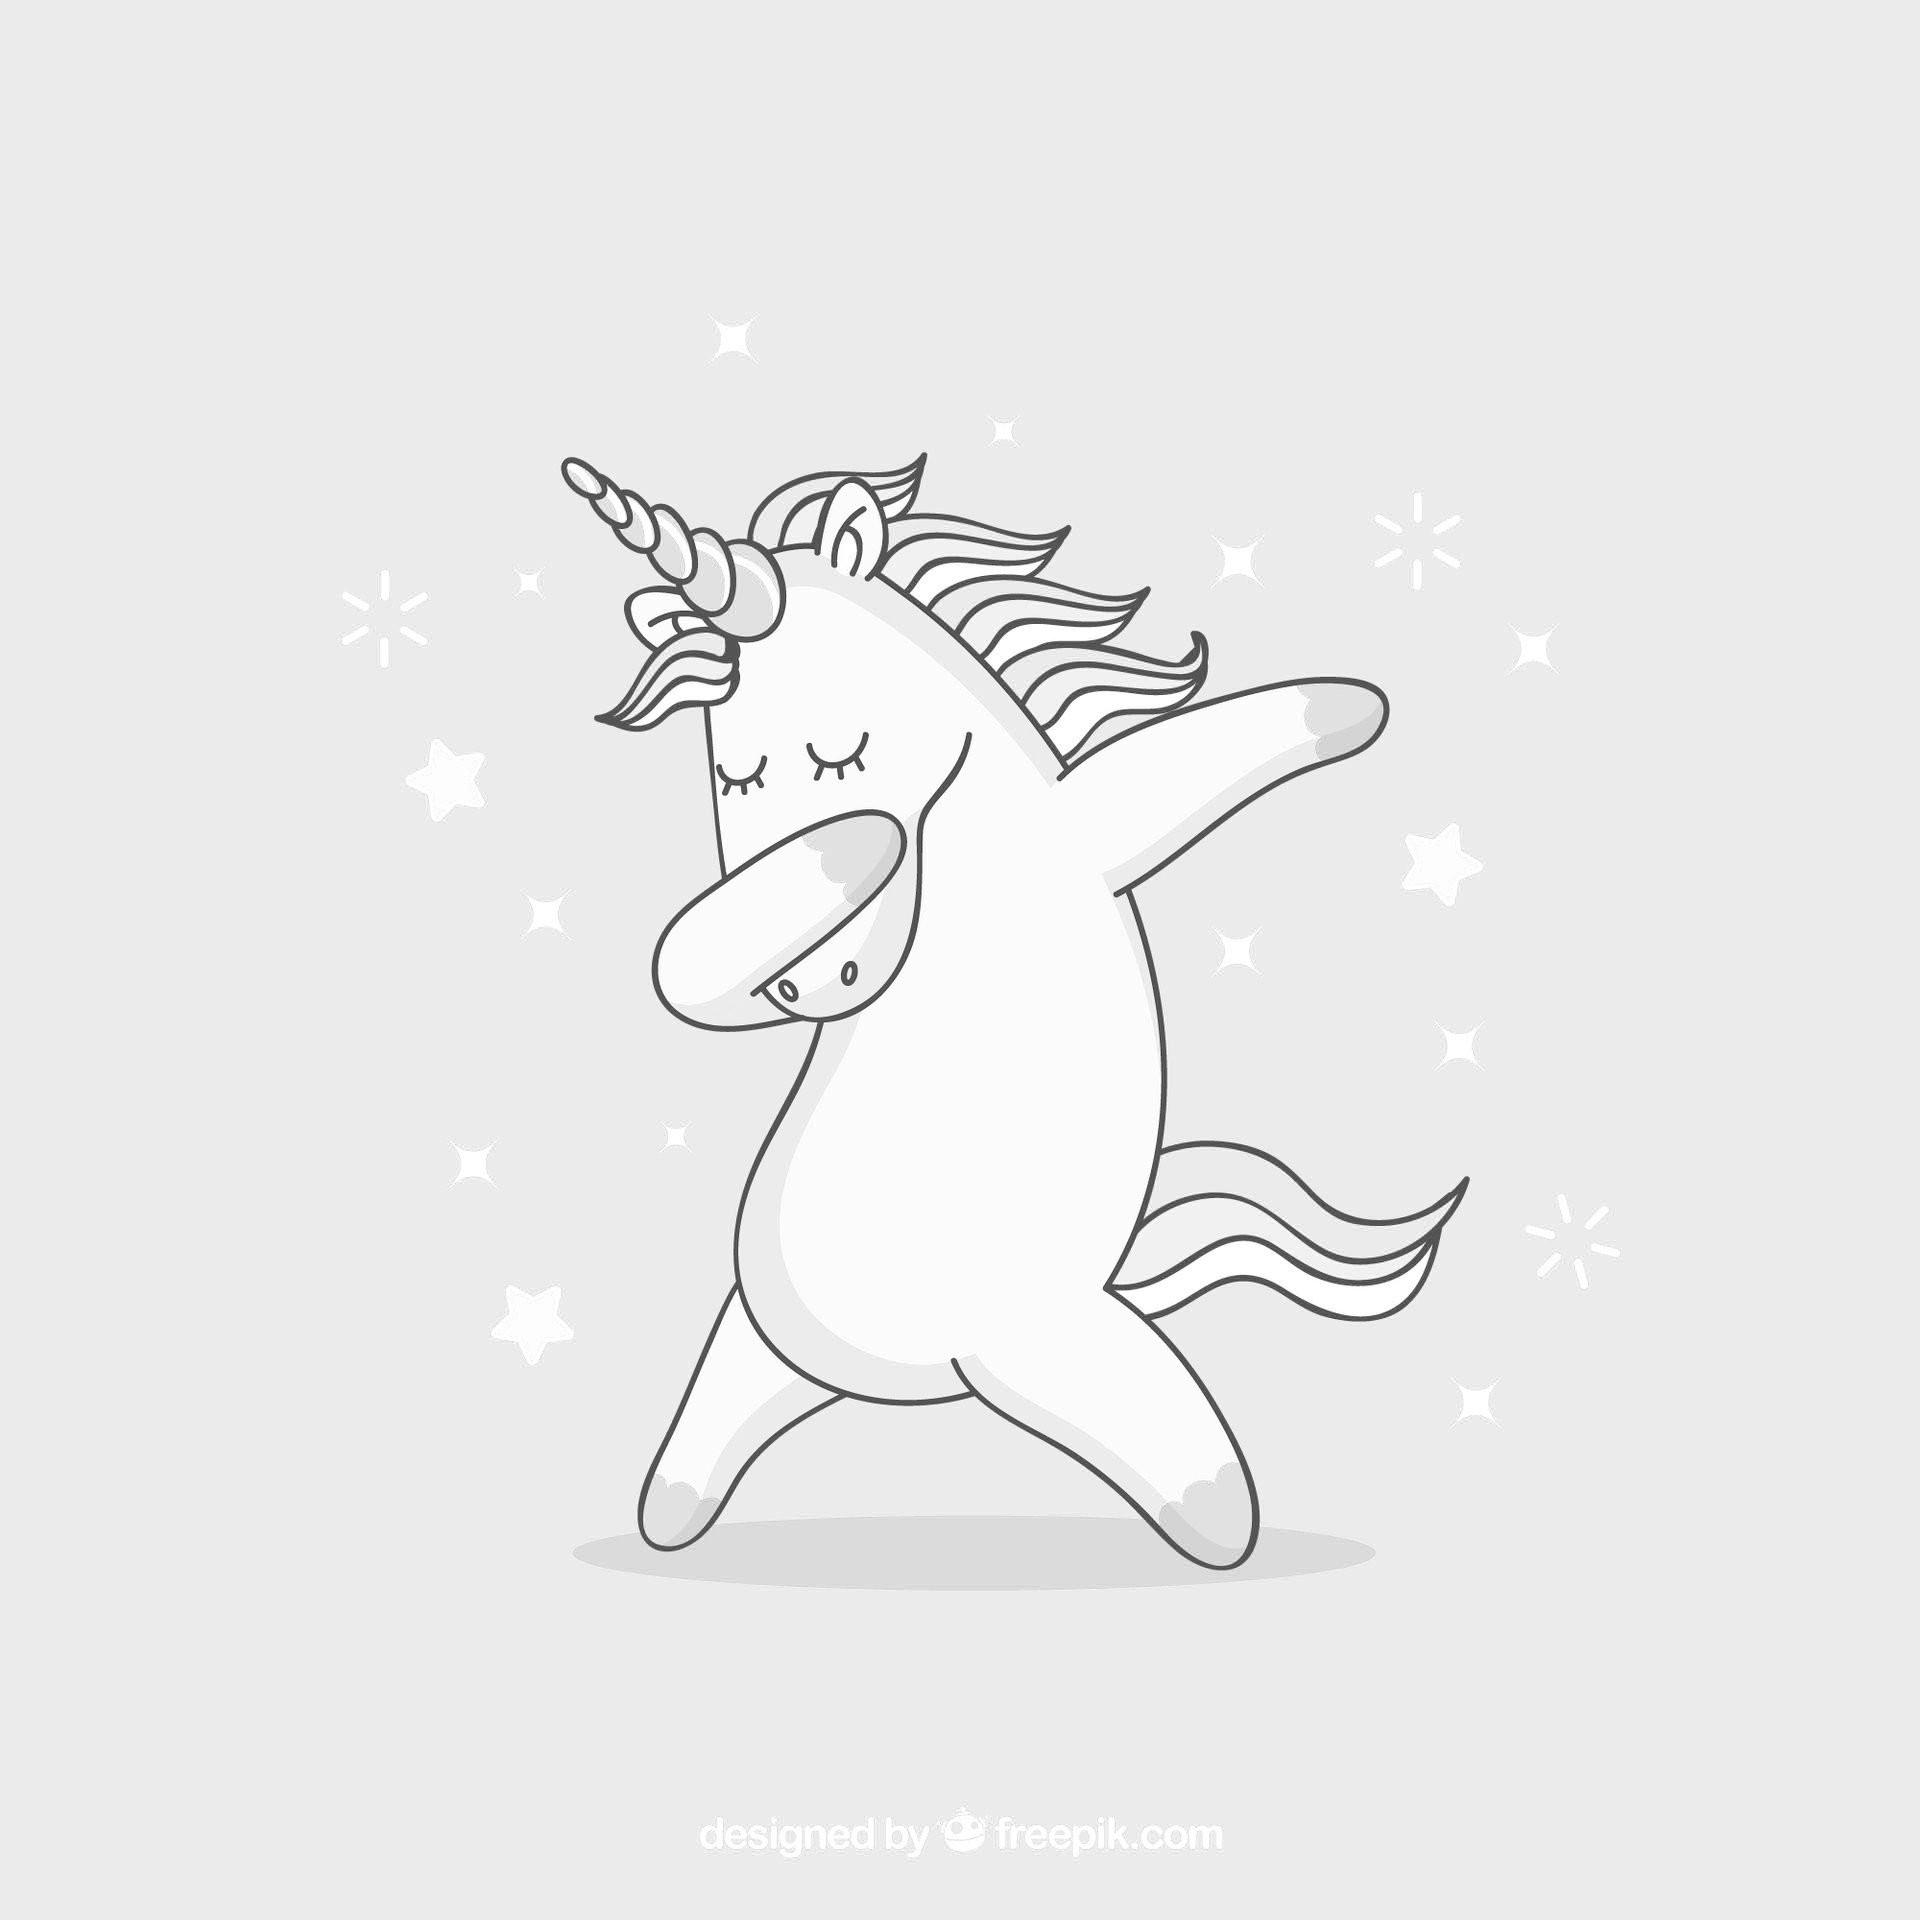 Ausmalbilder Pokemon Nachtara Einzigartig Dibujo Unicornio Kawaii Para Colorear Bilder